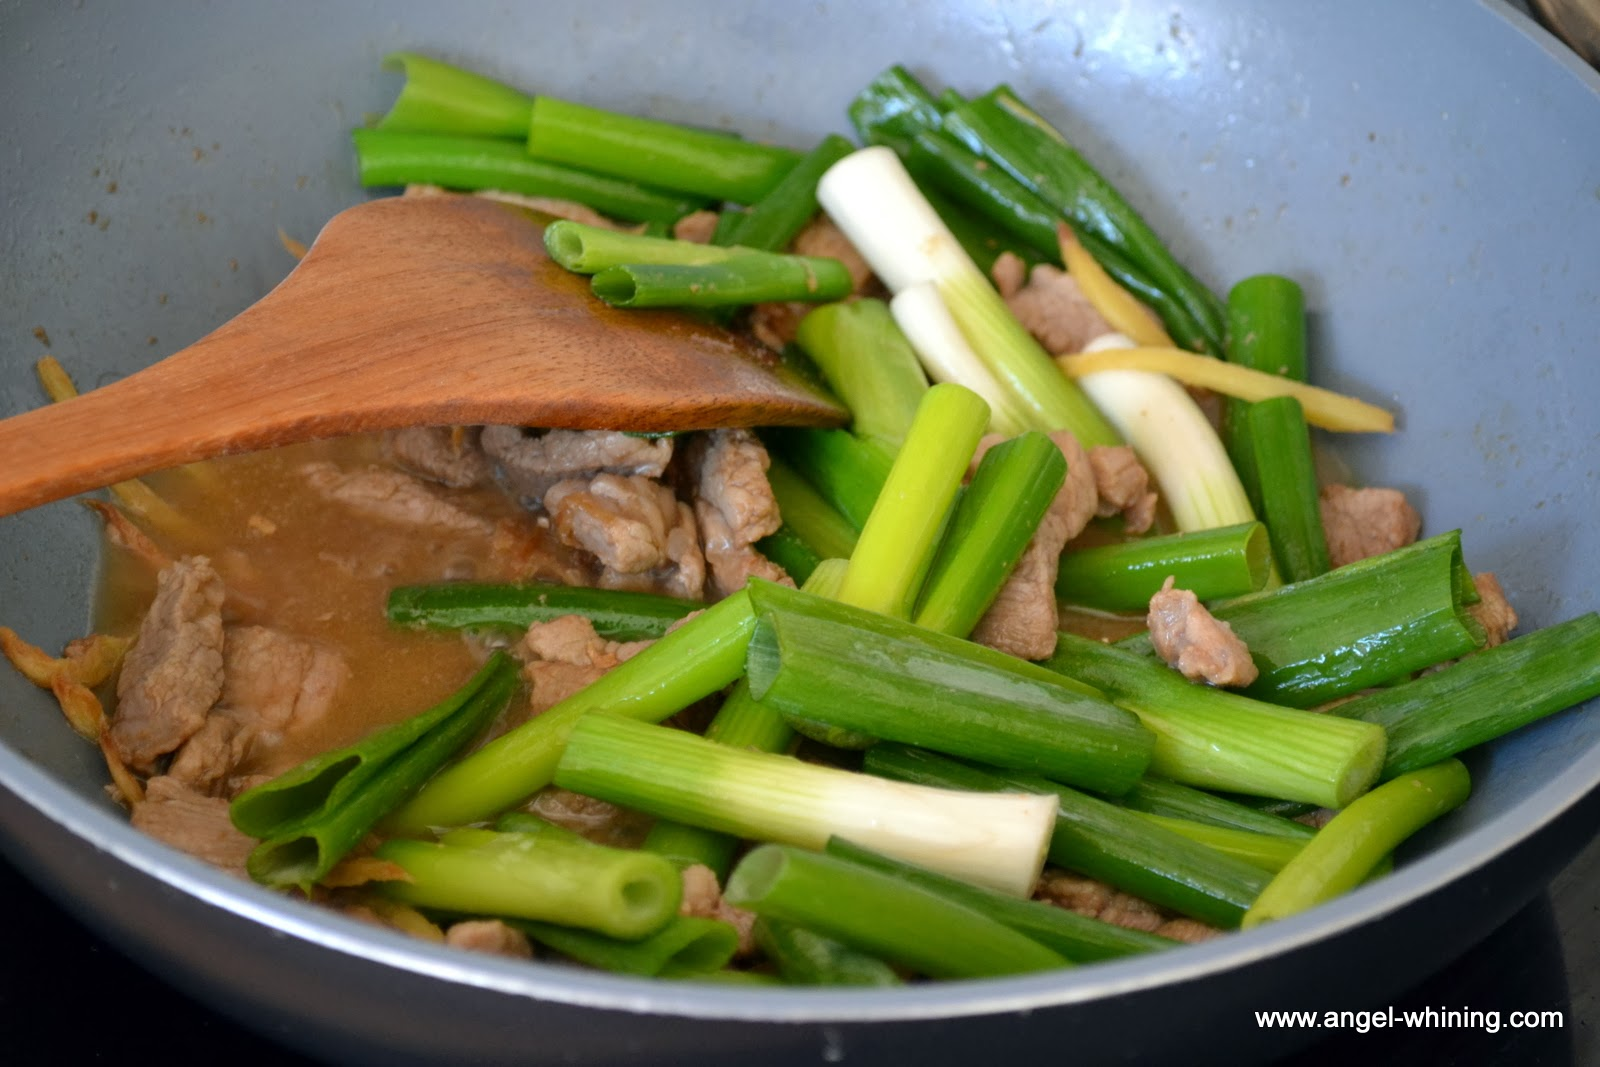 how to get rid of gamey porky taste